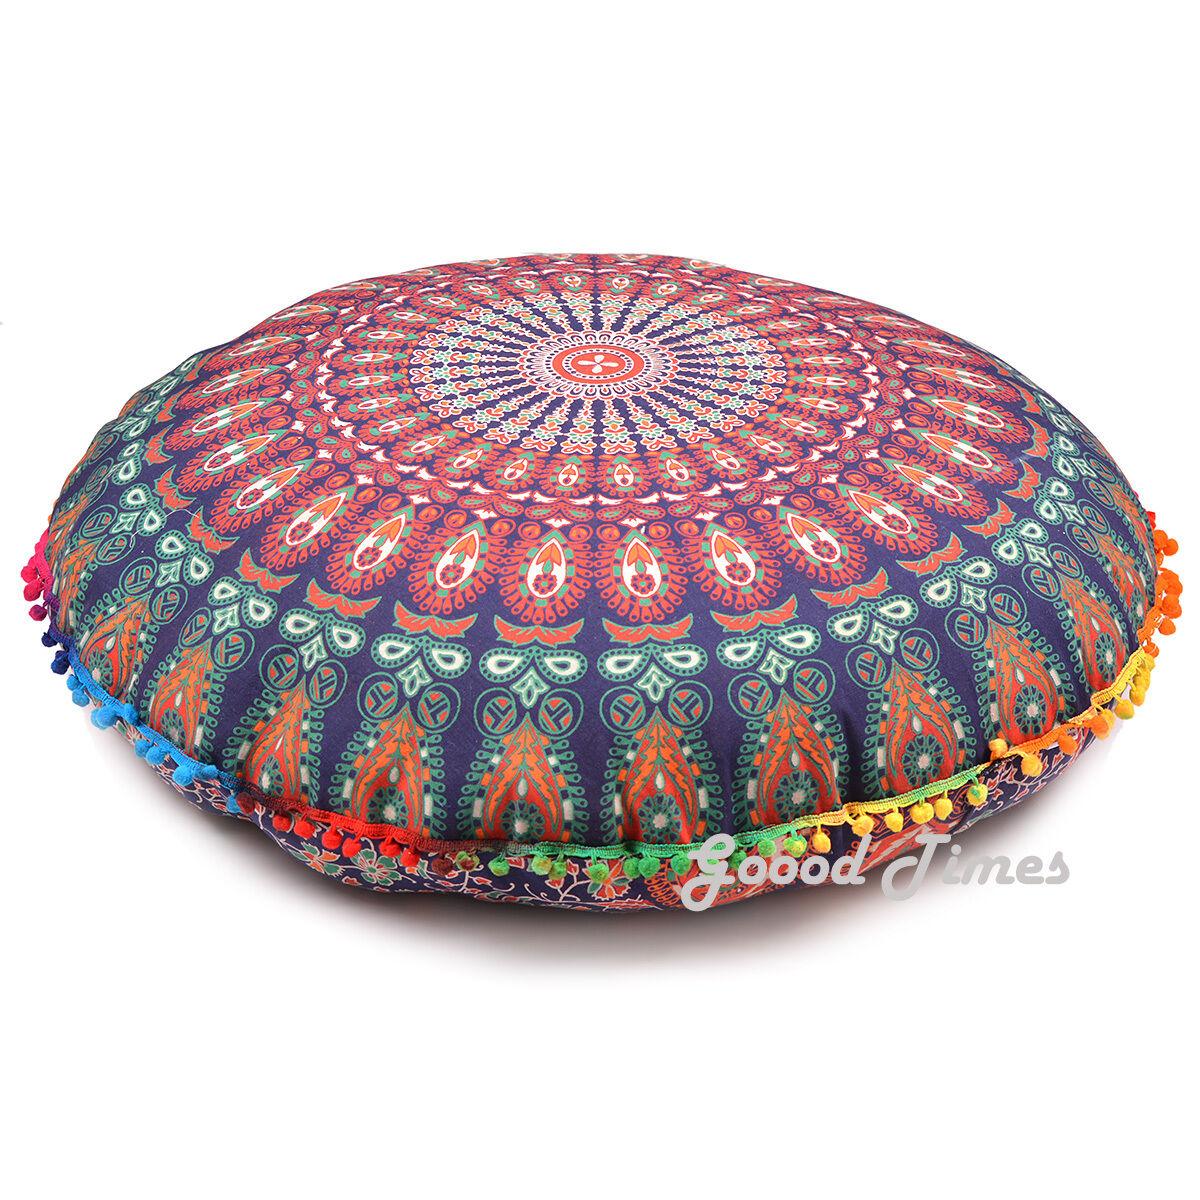 Floor  Large Pouf Cushion Cover Bohemian Indian Mandala Thro